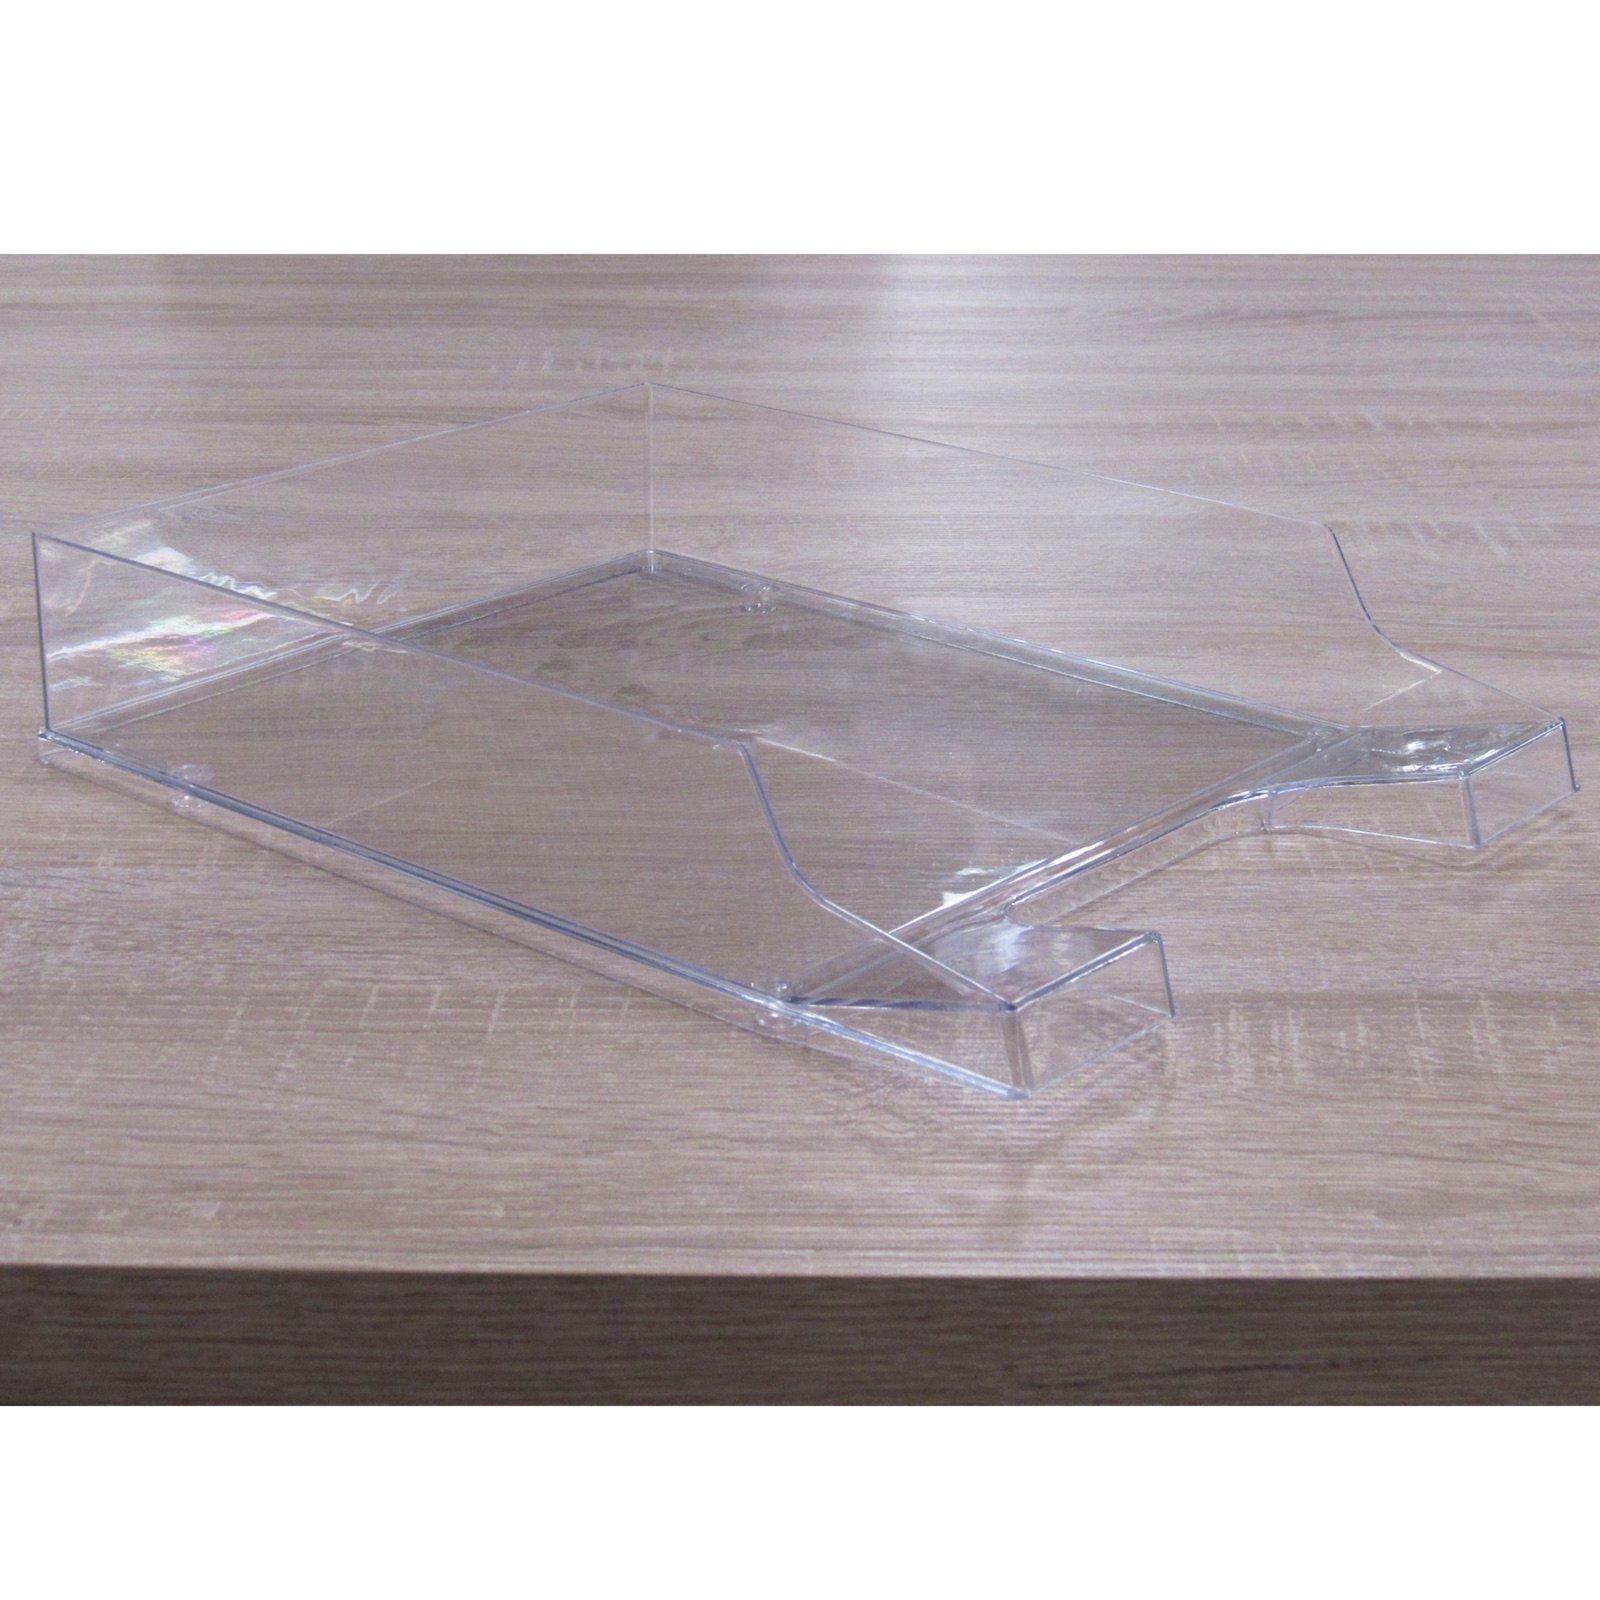 Dokumentenablage - transparent - Kunststoff